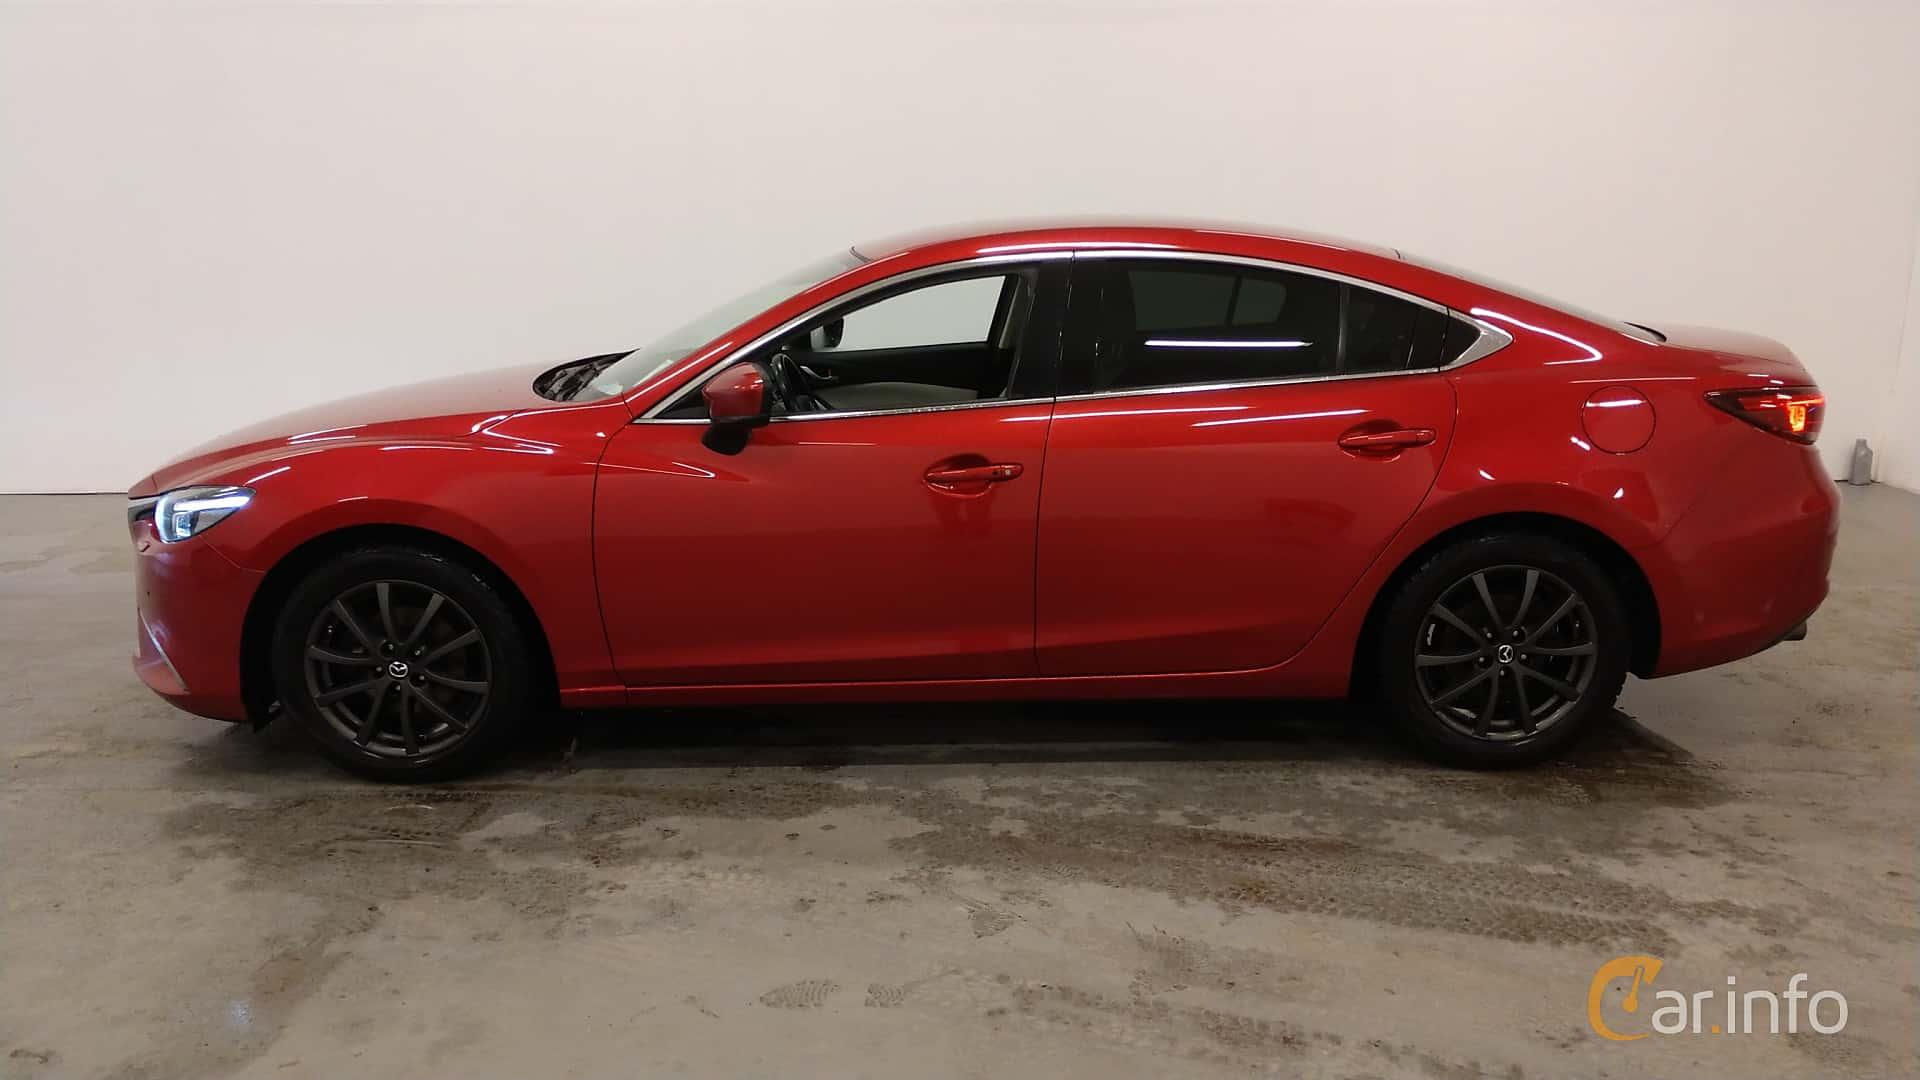 Mazda 6 Sedan 2.5 SKYACTIV-G Automatic, 192hp, 2017